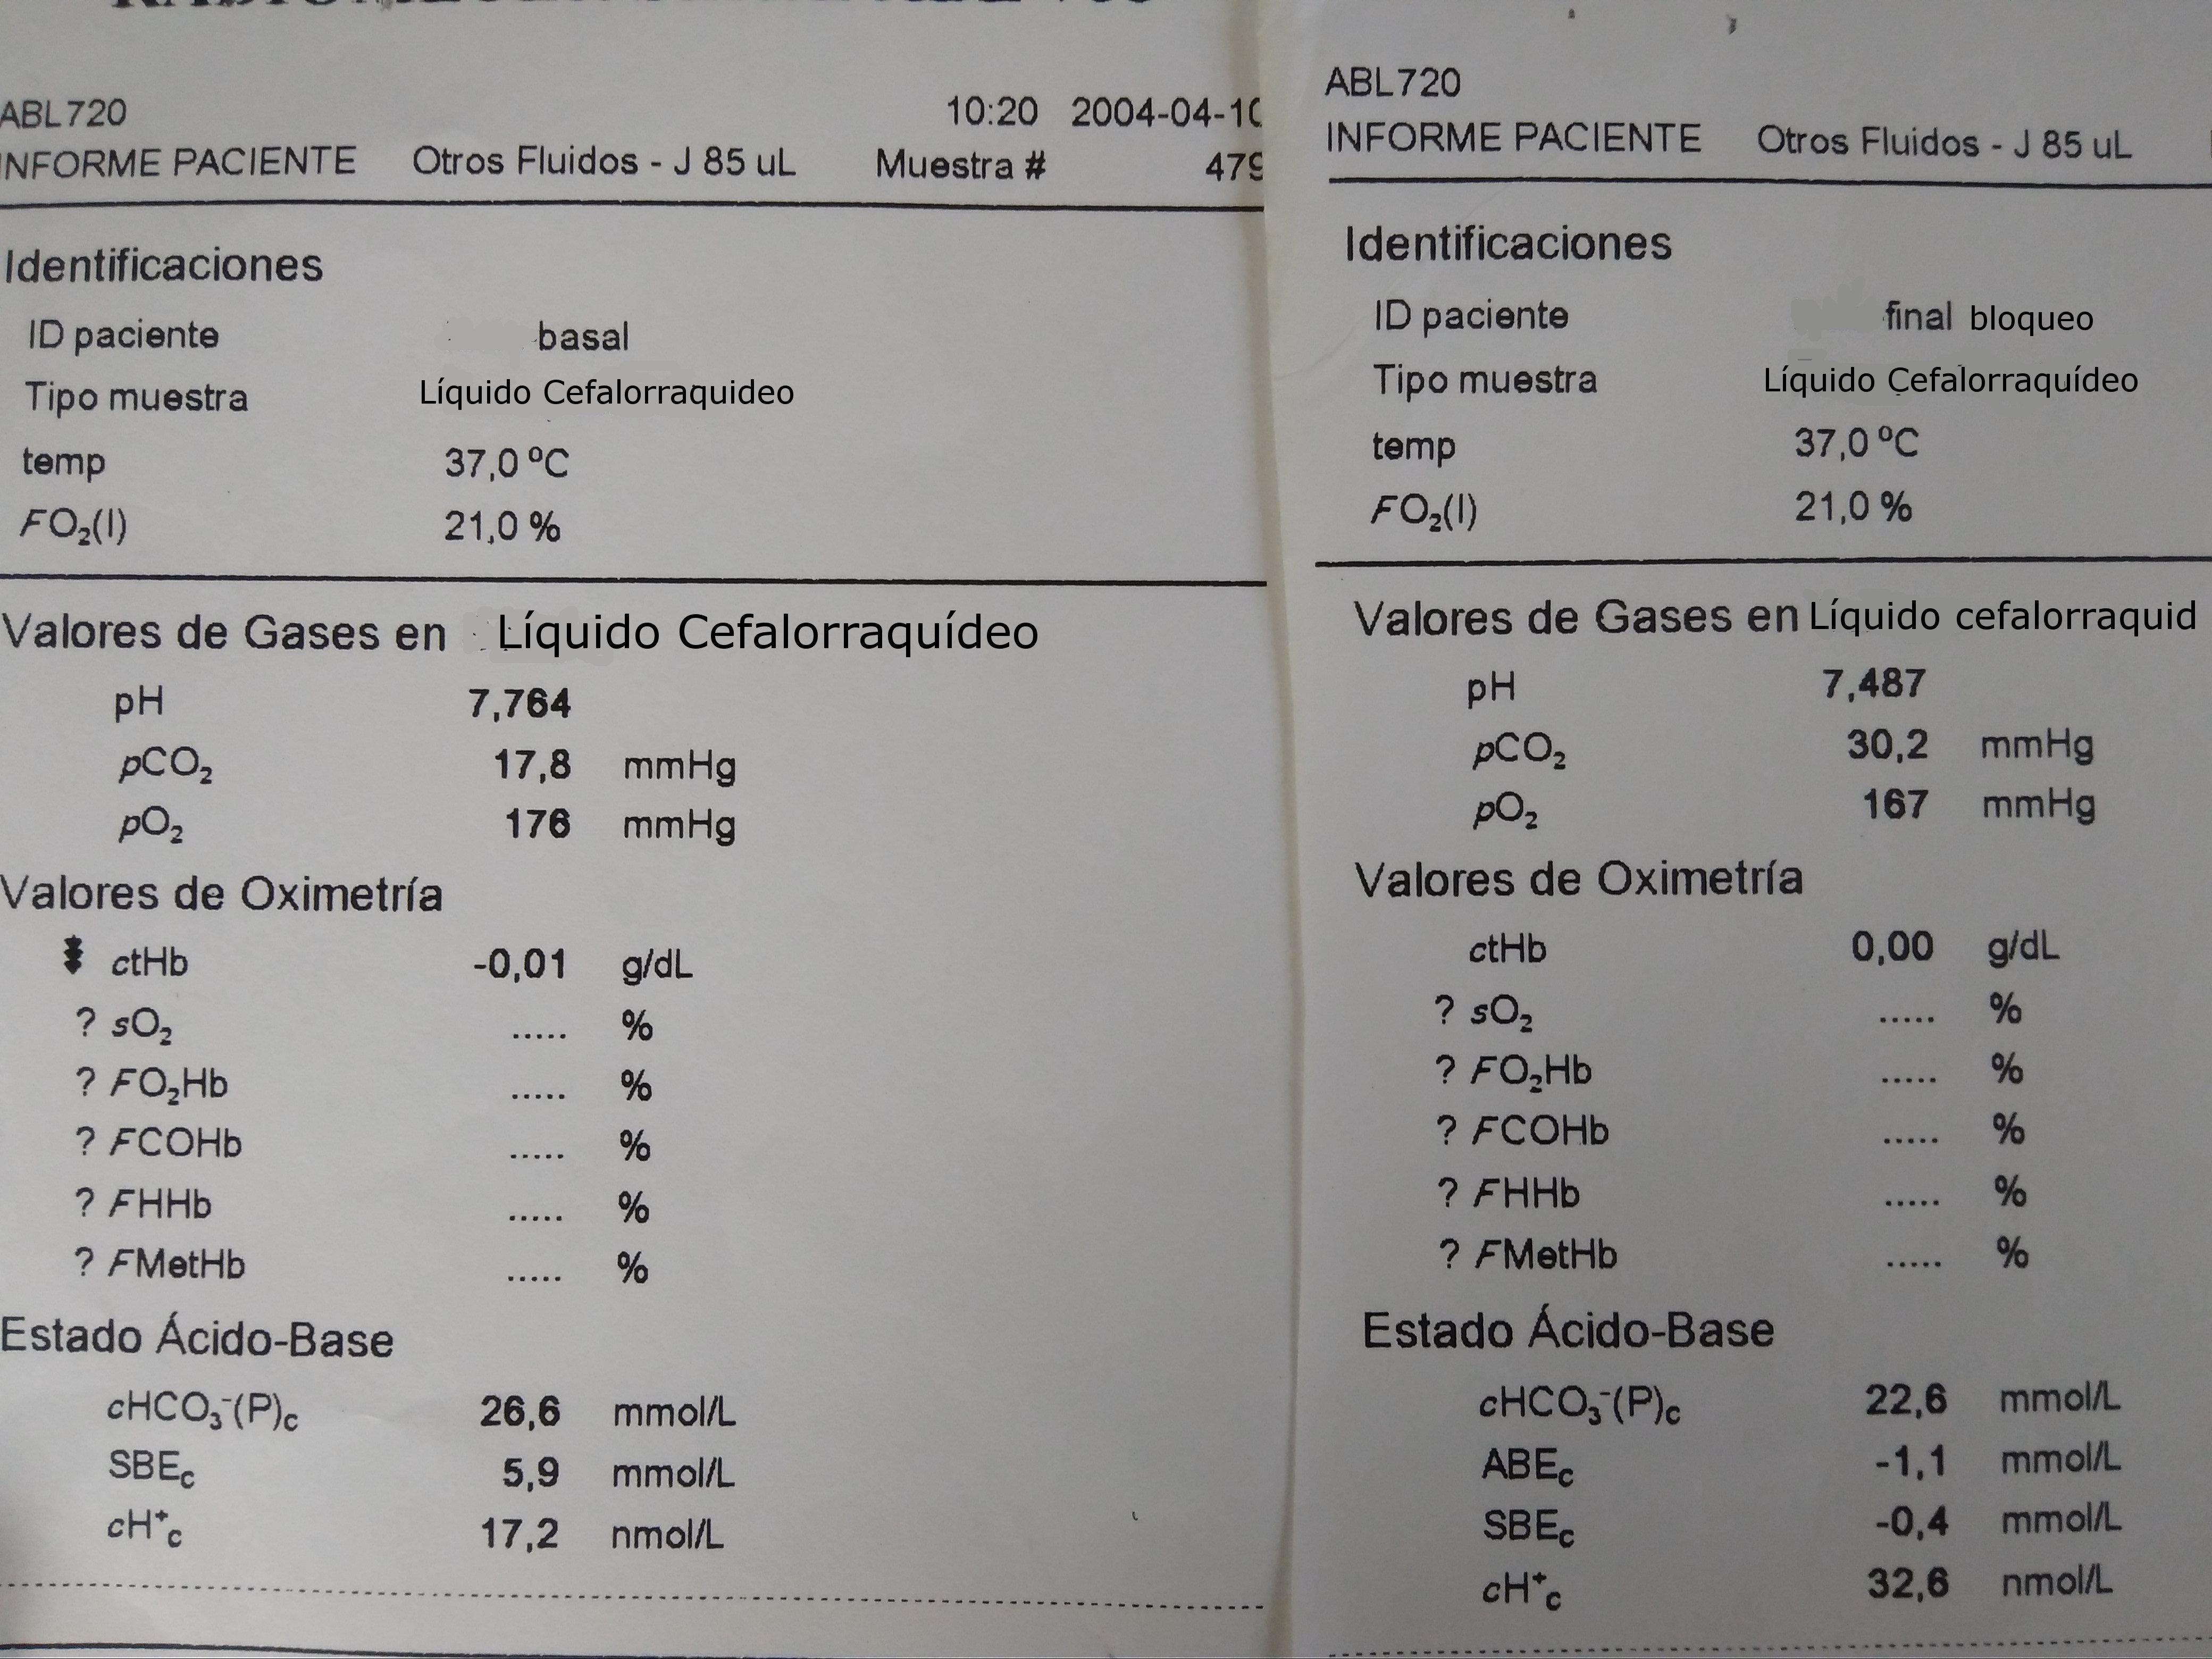 Gasometrías de LCR. CSF gasometries.